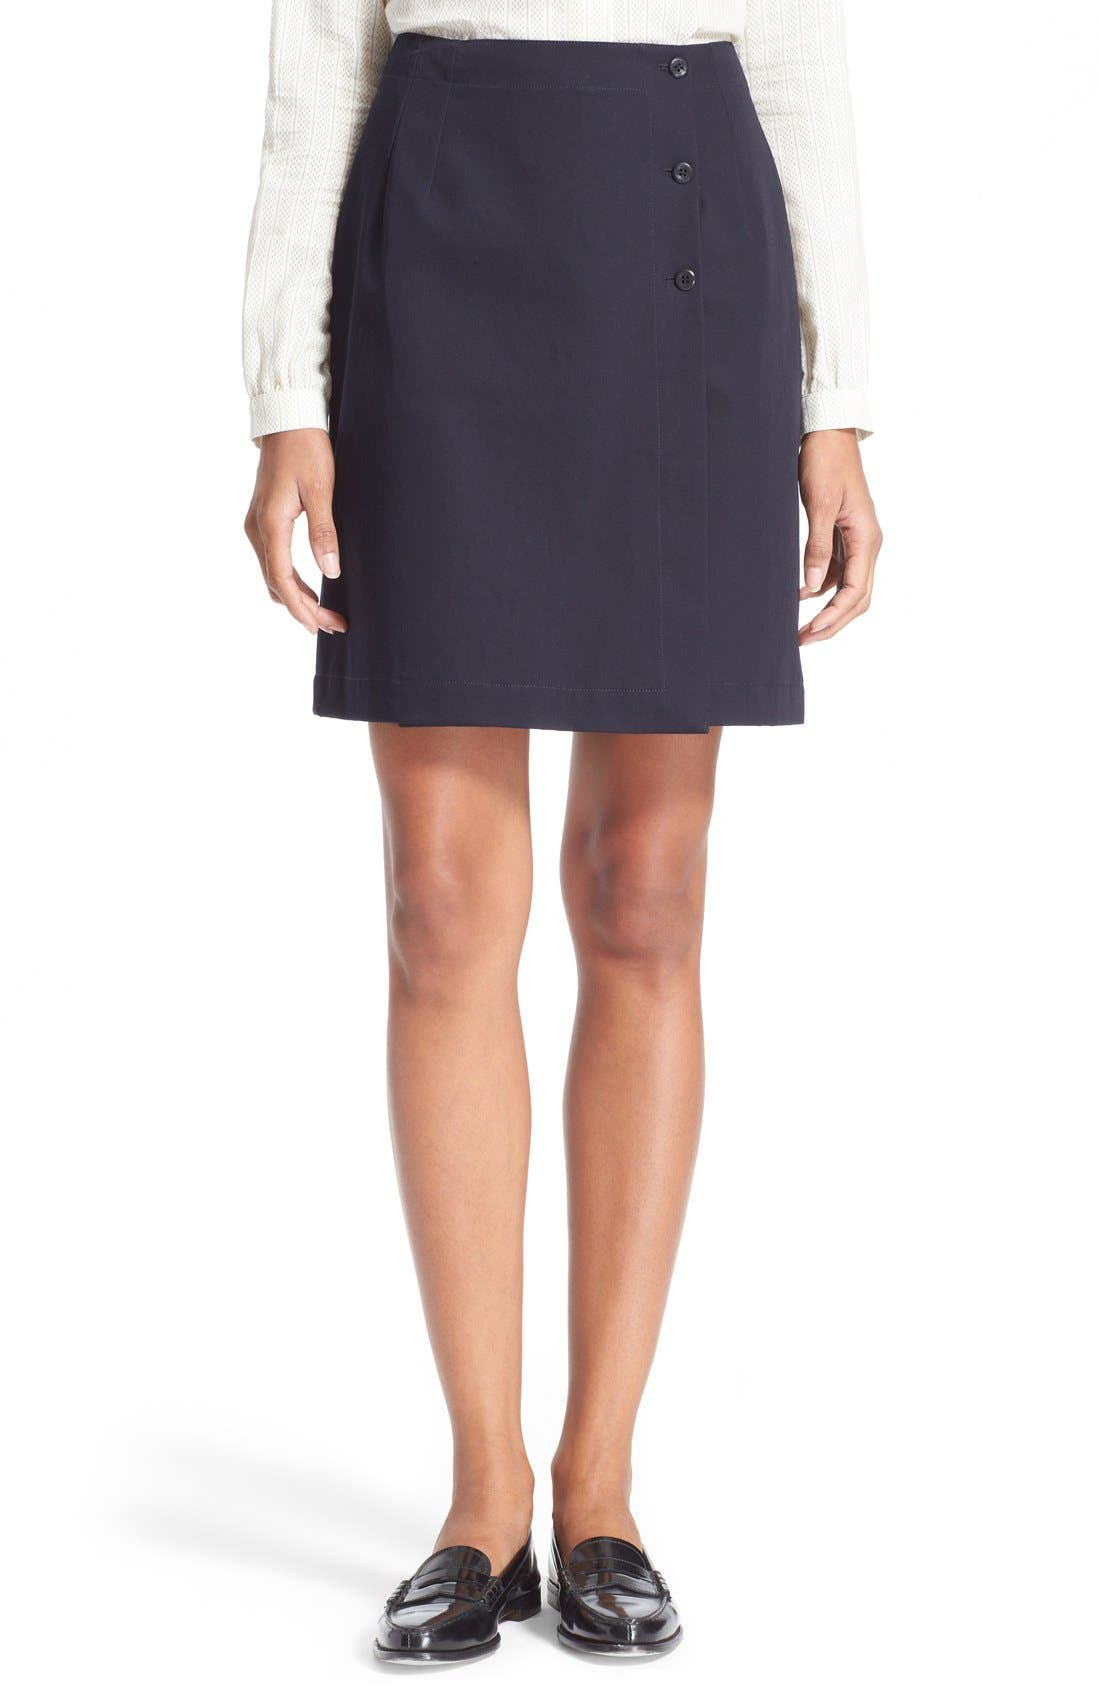 Alternate Image 1 Selected - A.P.C. 'Lana' Cotton Skirt